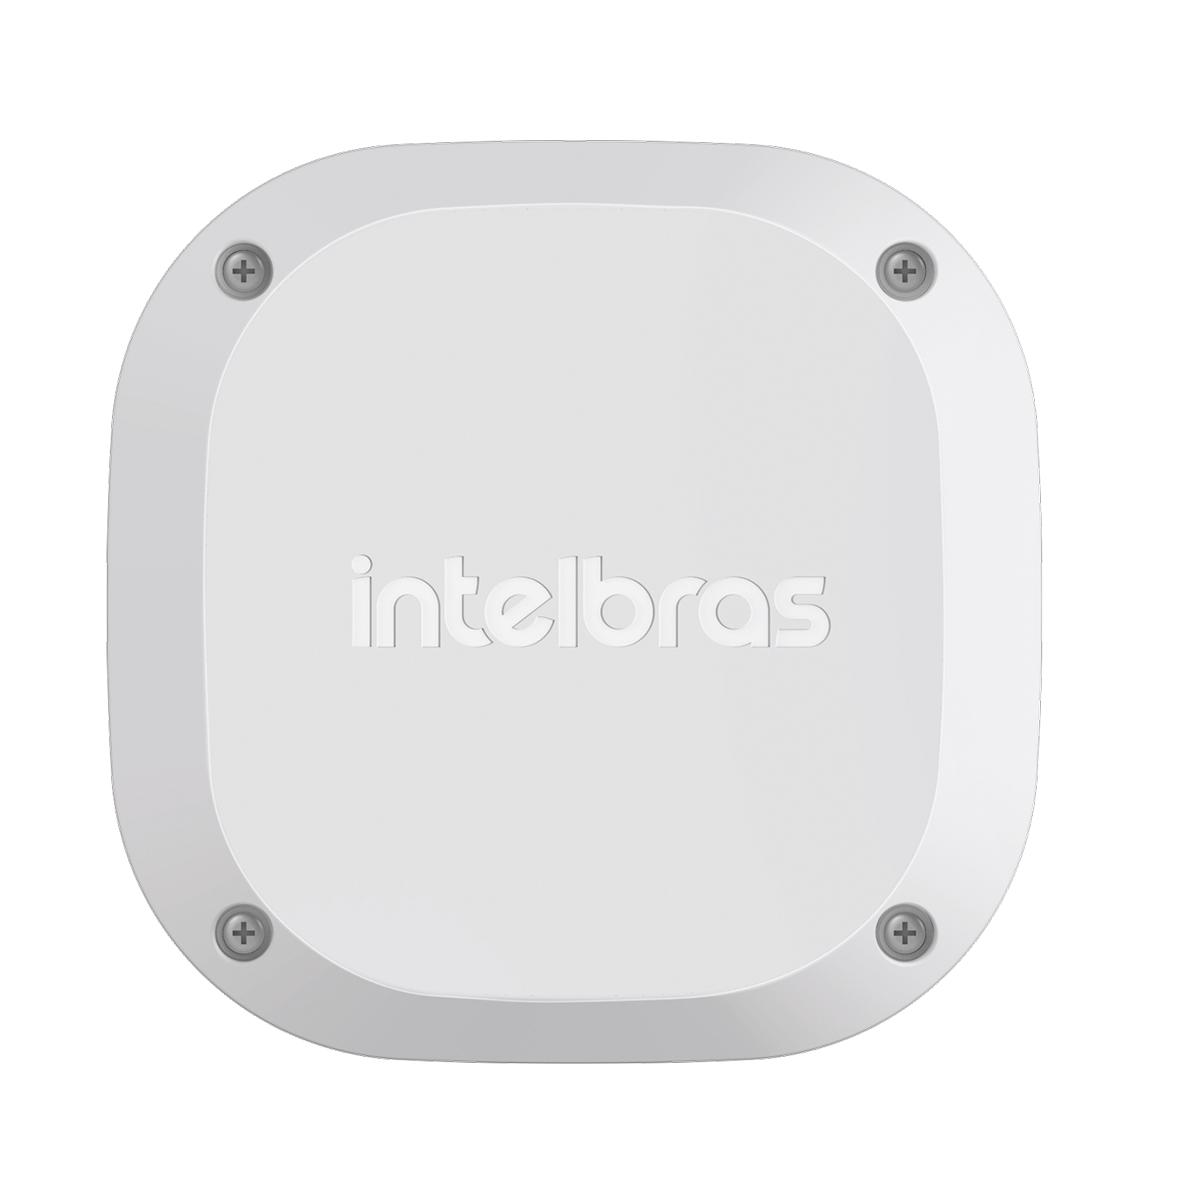 Caixa de Passagem para CFTV VBOX 1100 E Intelbras xxx